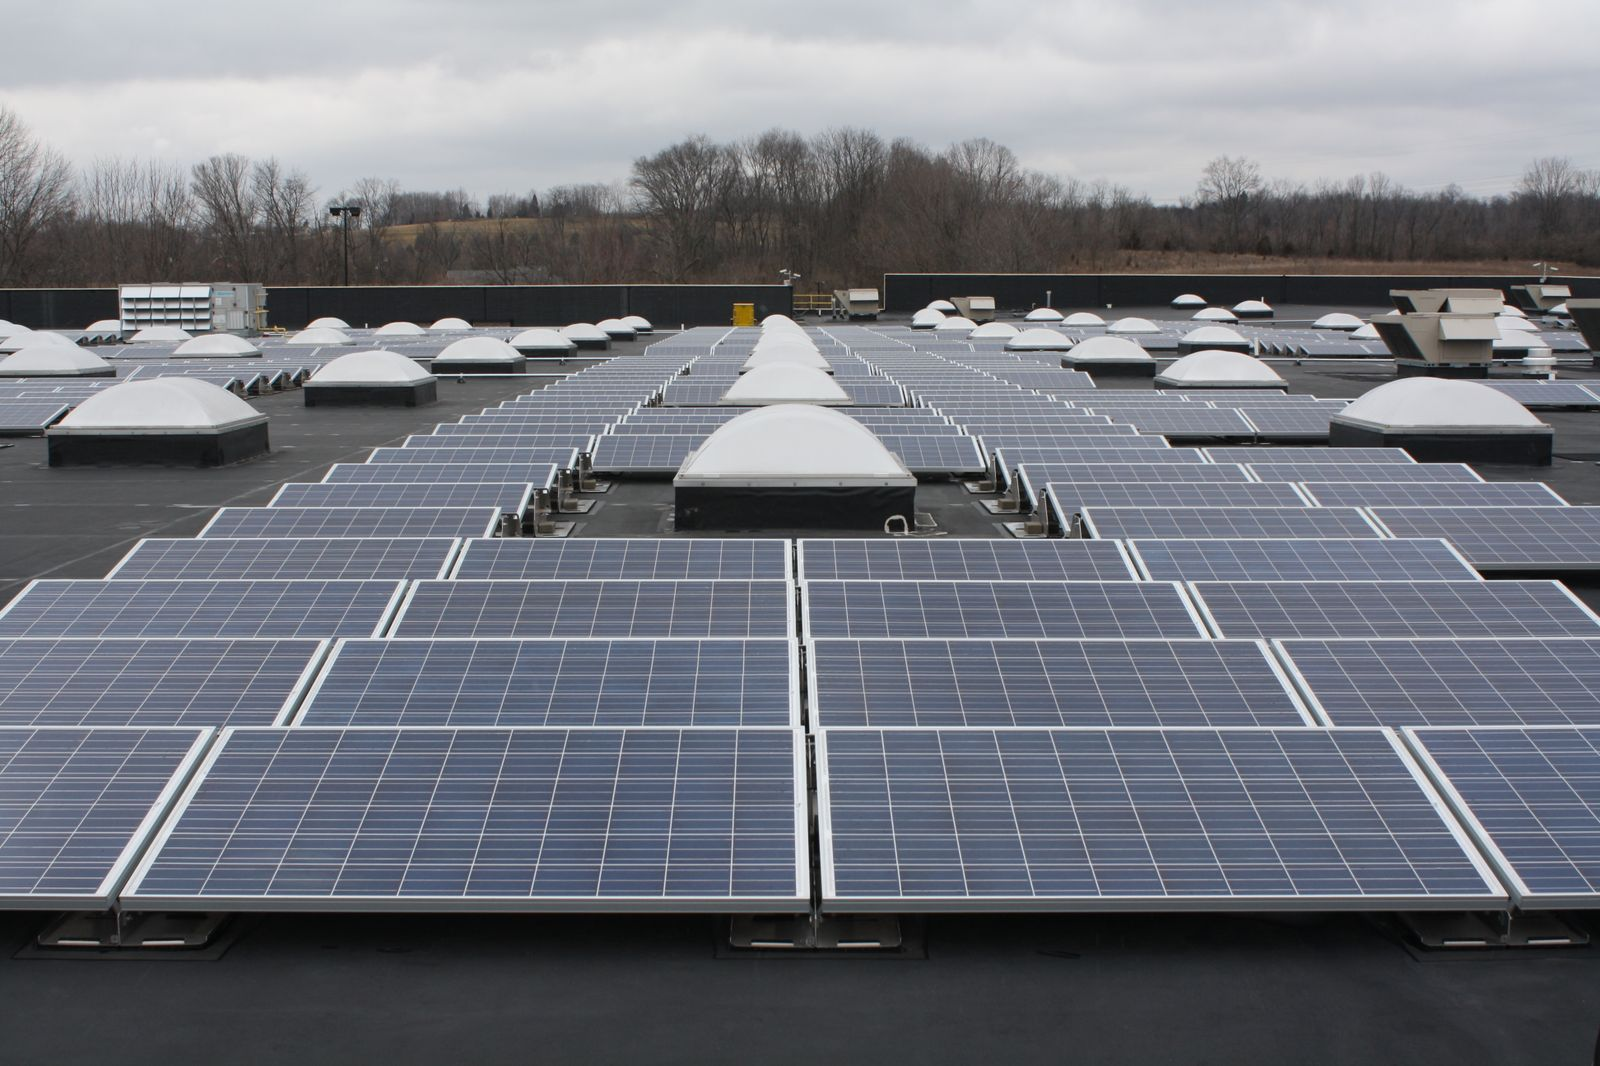 solar-panels-on-ohio-store-3784-roof_130068835202675843